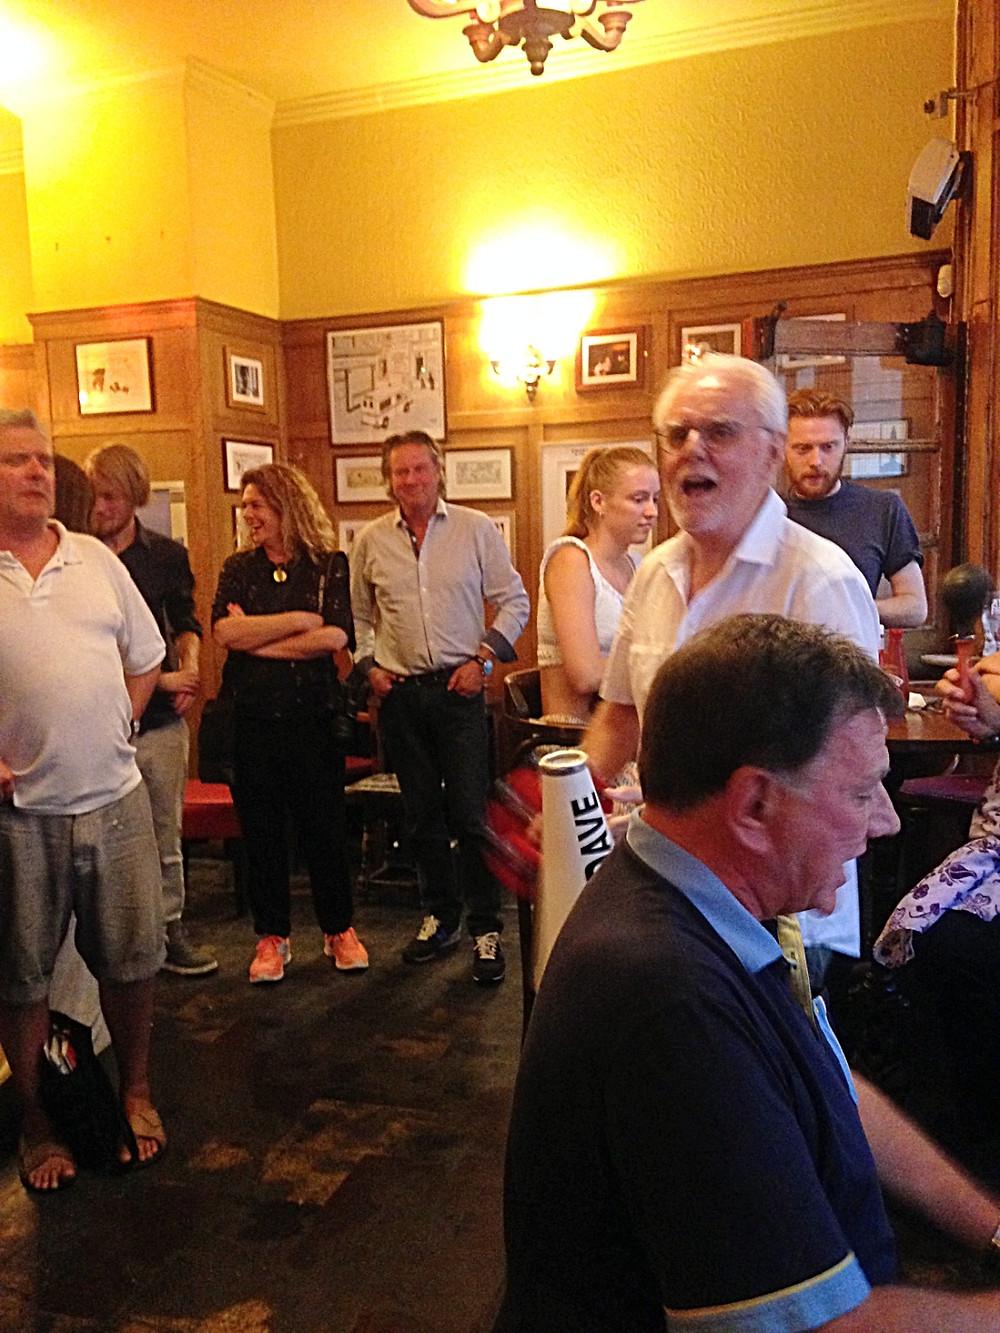 pub sing-a-long.  The Coach & Horses